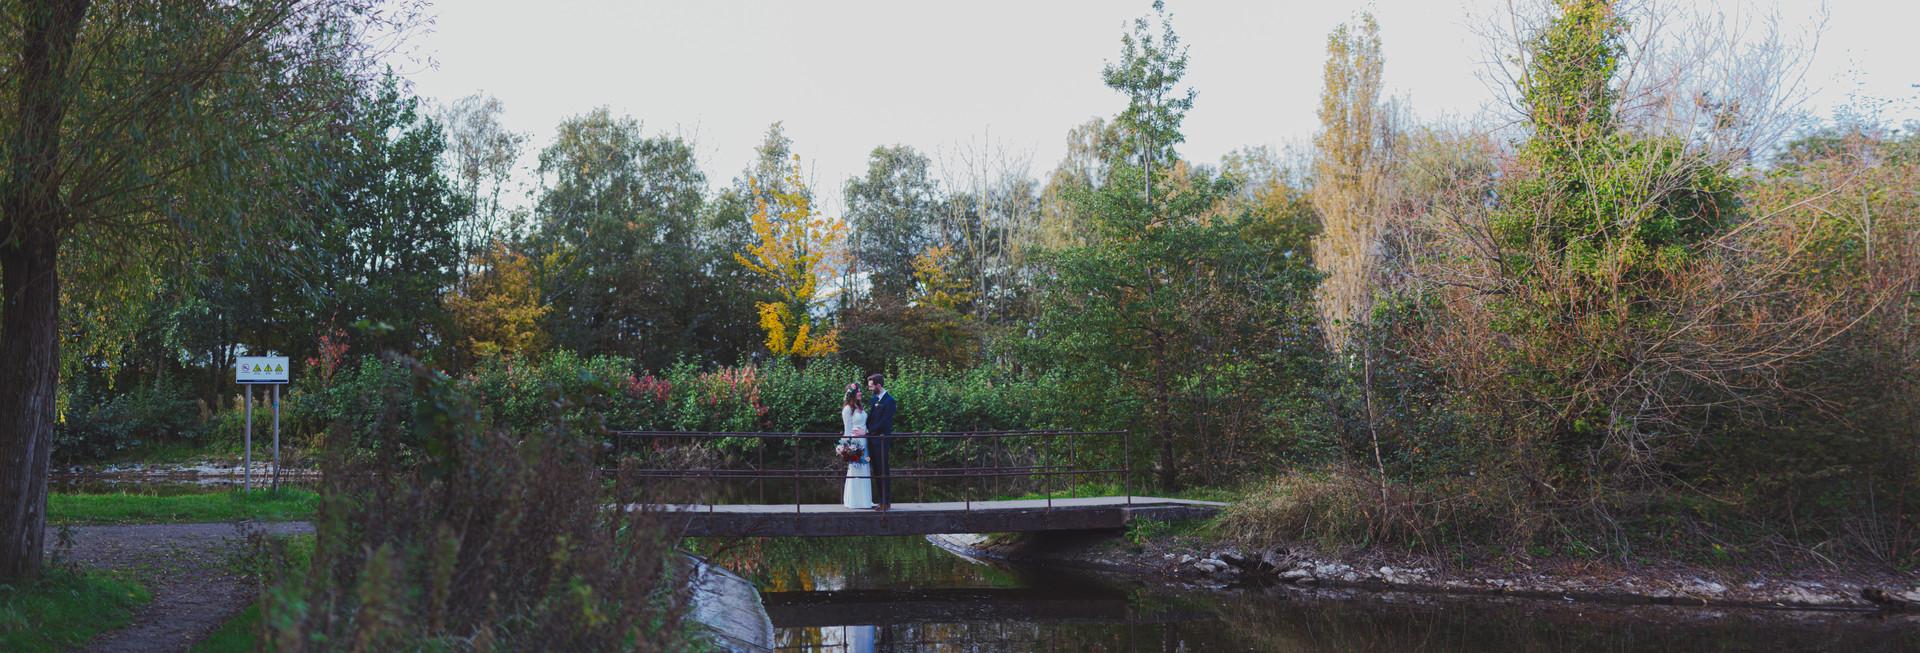 Victoria Park Wedding Photos | Boho Bride & Groom | Quirky Wedding | Living Witness Weddings